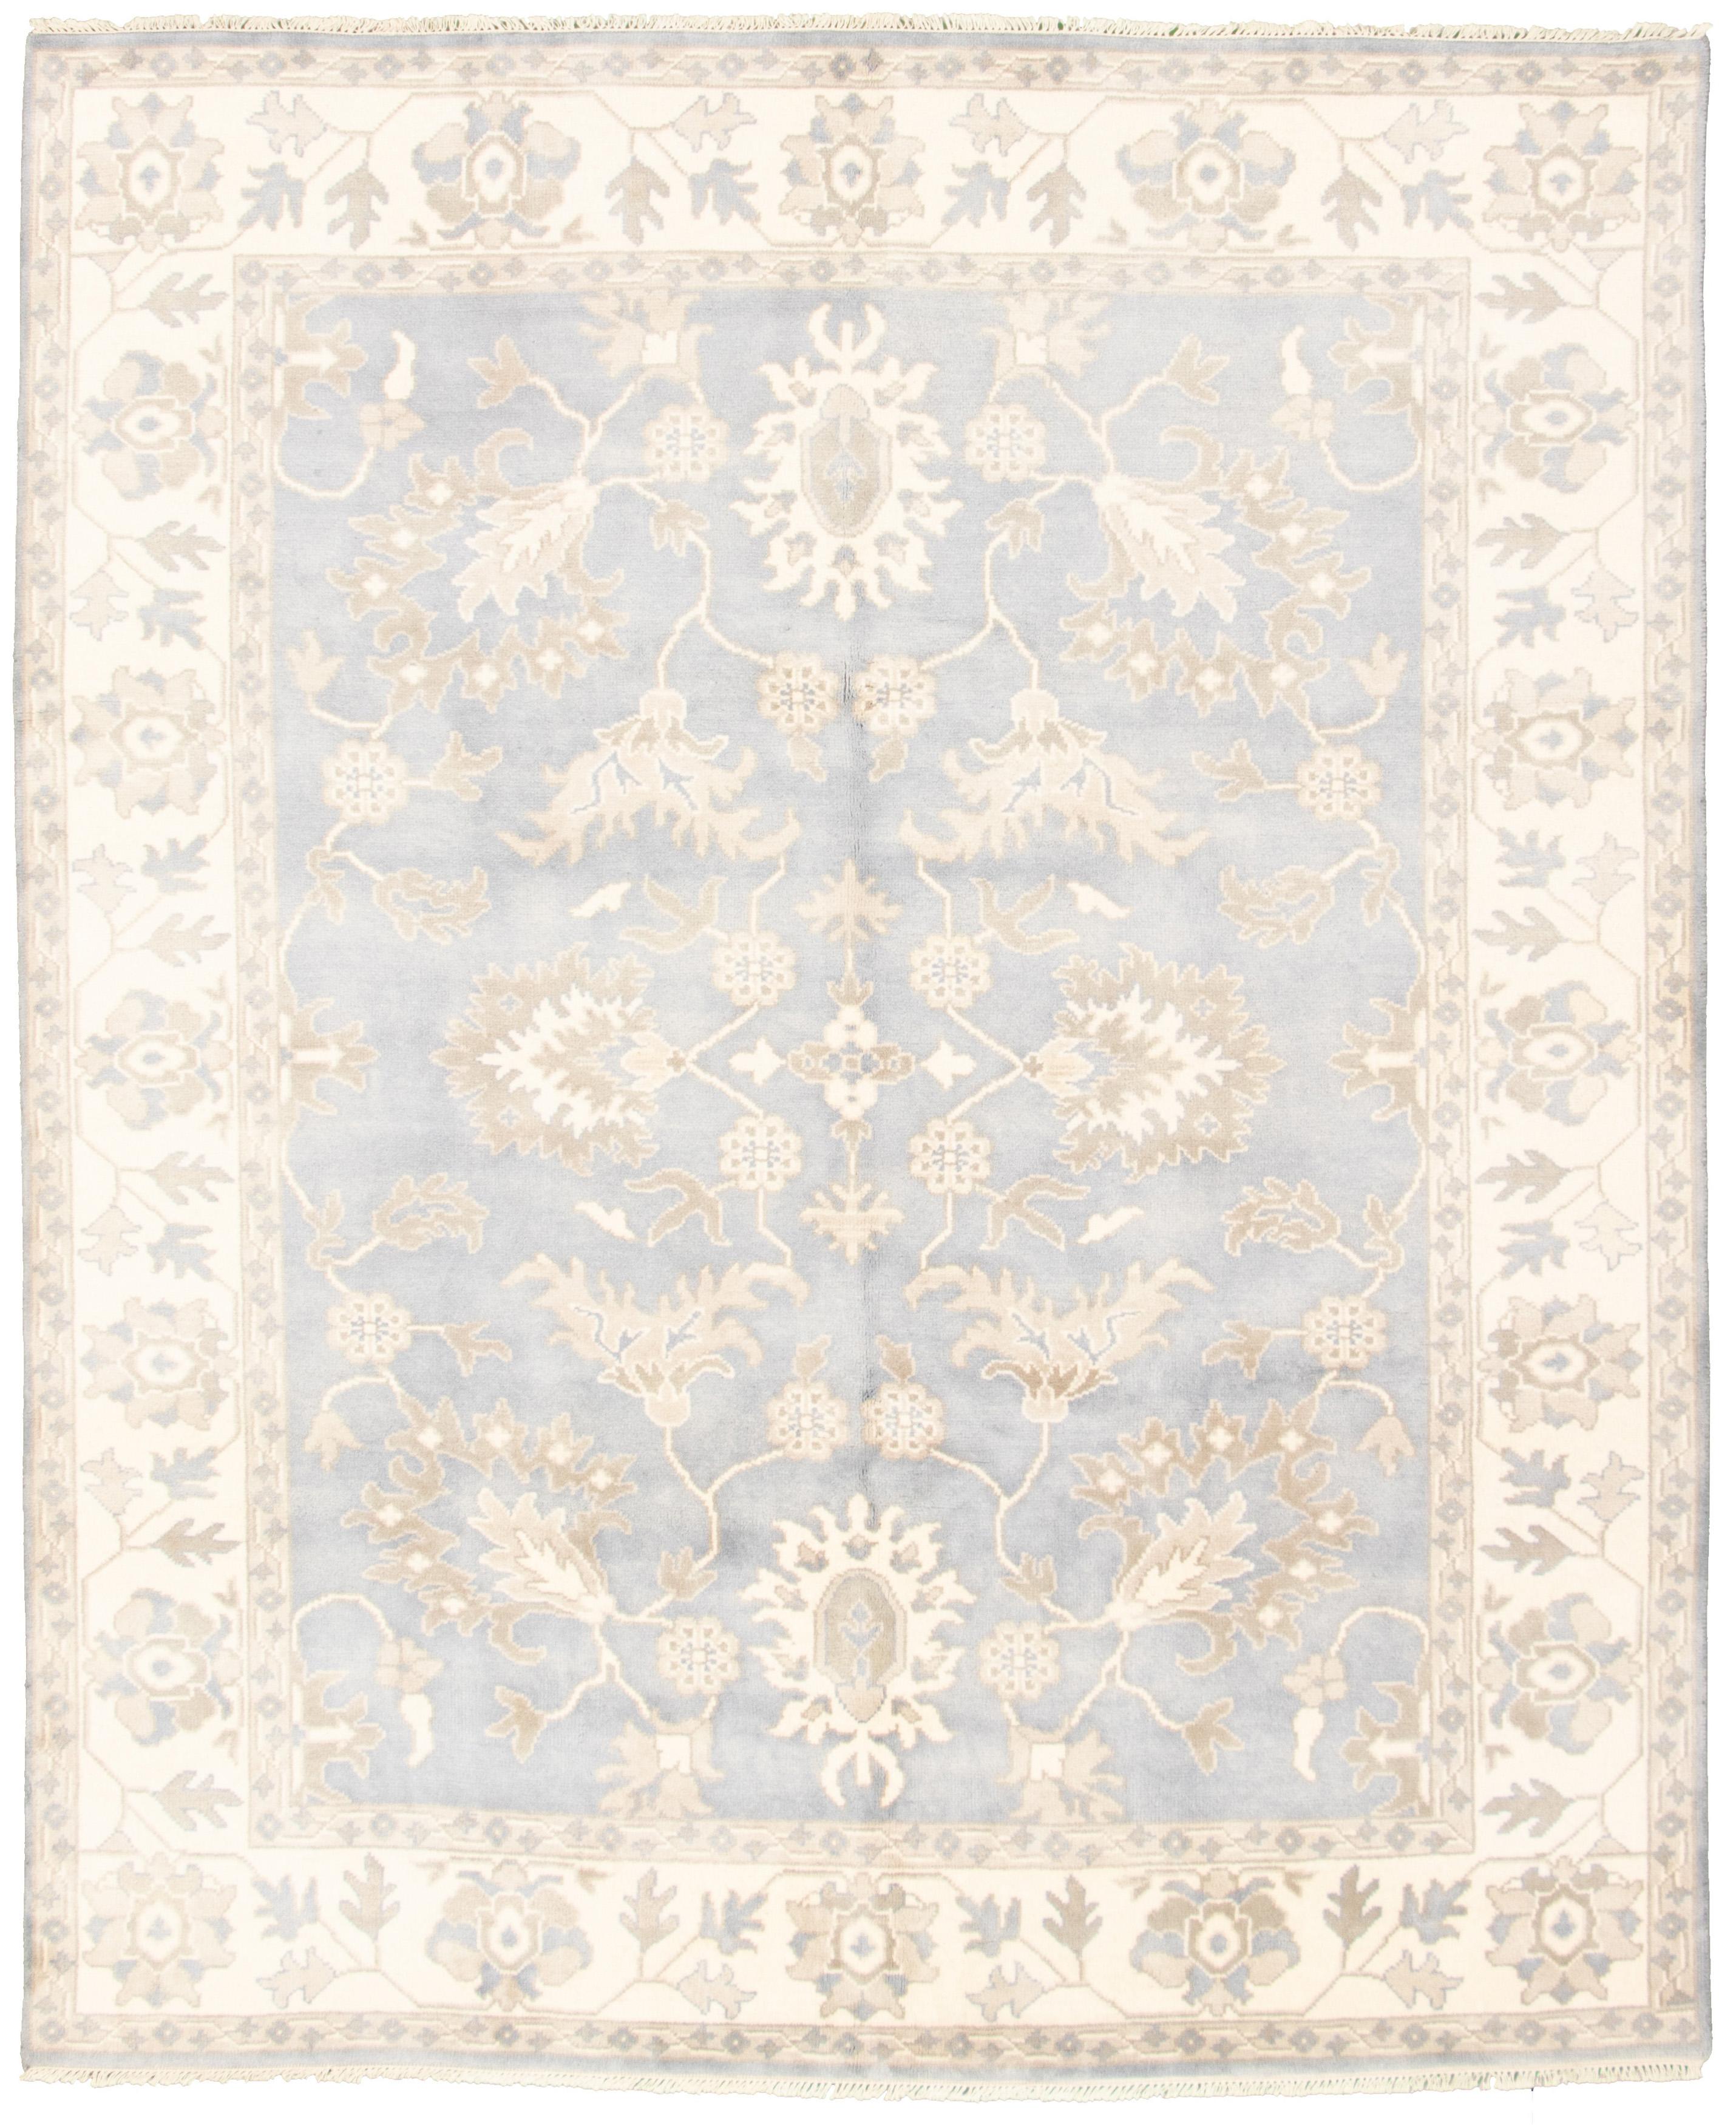 "Hand-knotted Royal Ushak Light Denim Blue Wool Rug 8'2"" x 10'0""  Size: 8'2"" x 10'0"""